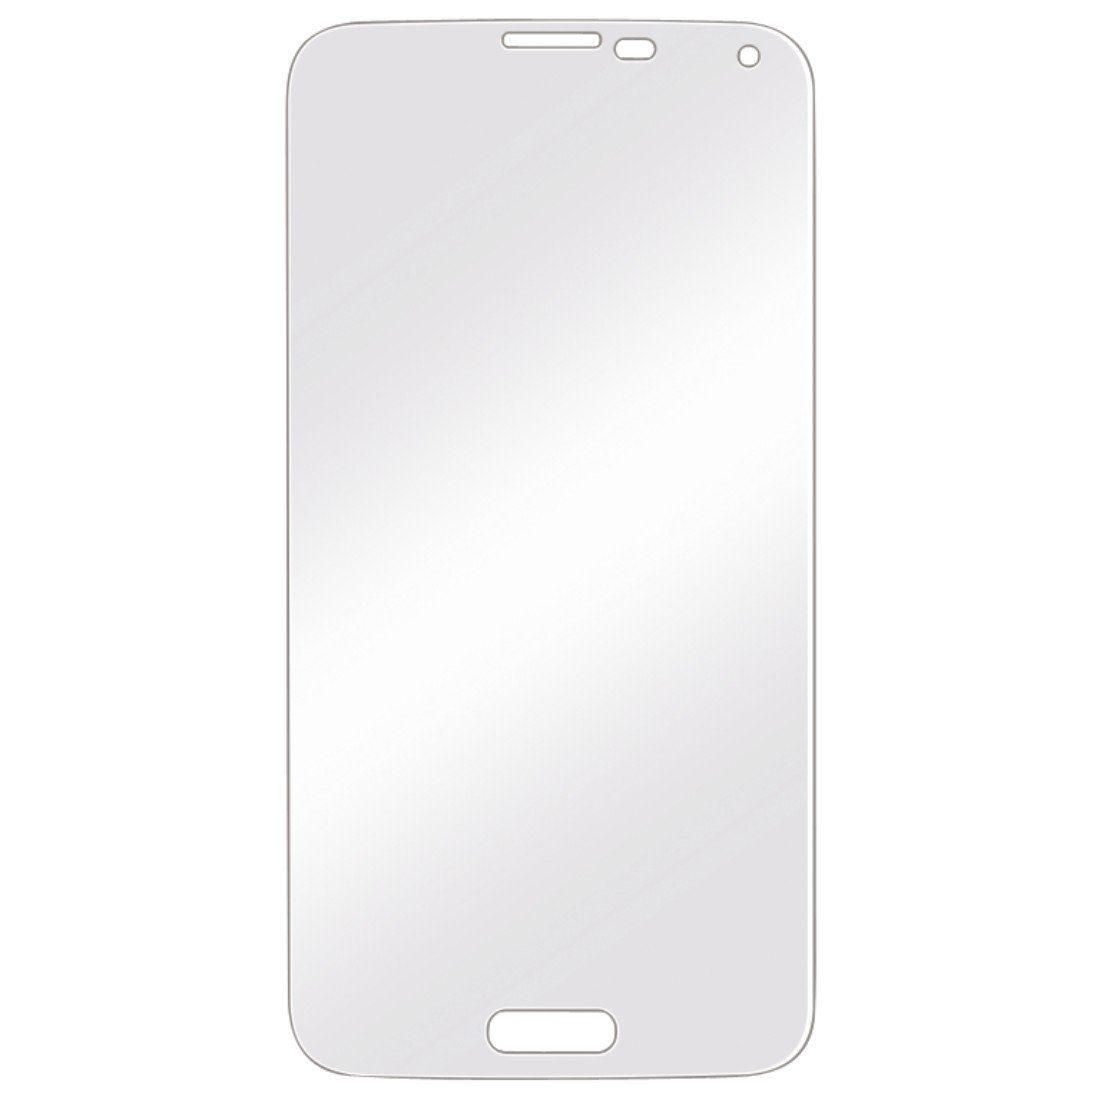 Hama Display-Schutzfolie für Samsung Galaxy S5 mini, 2 Stück